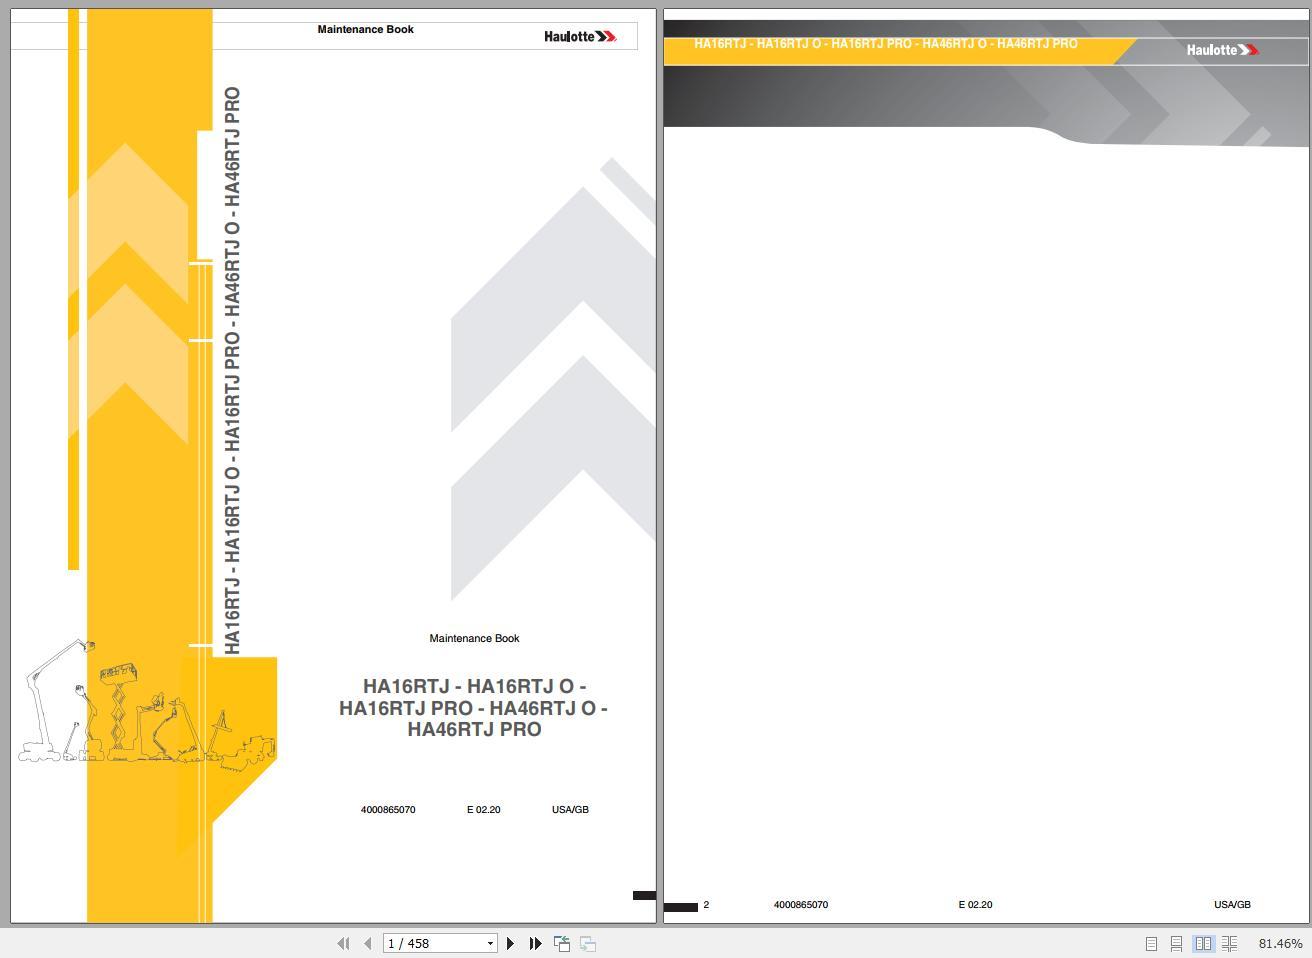 Haulotte_Work_Platforms_062020_Service_Maintenance_Operators_Manual_Training_Spare_Parts_Manual_DVD1